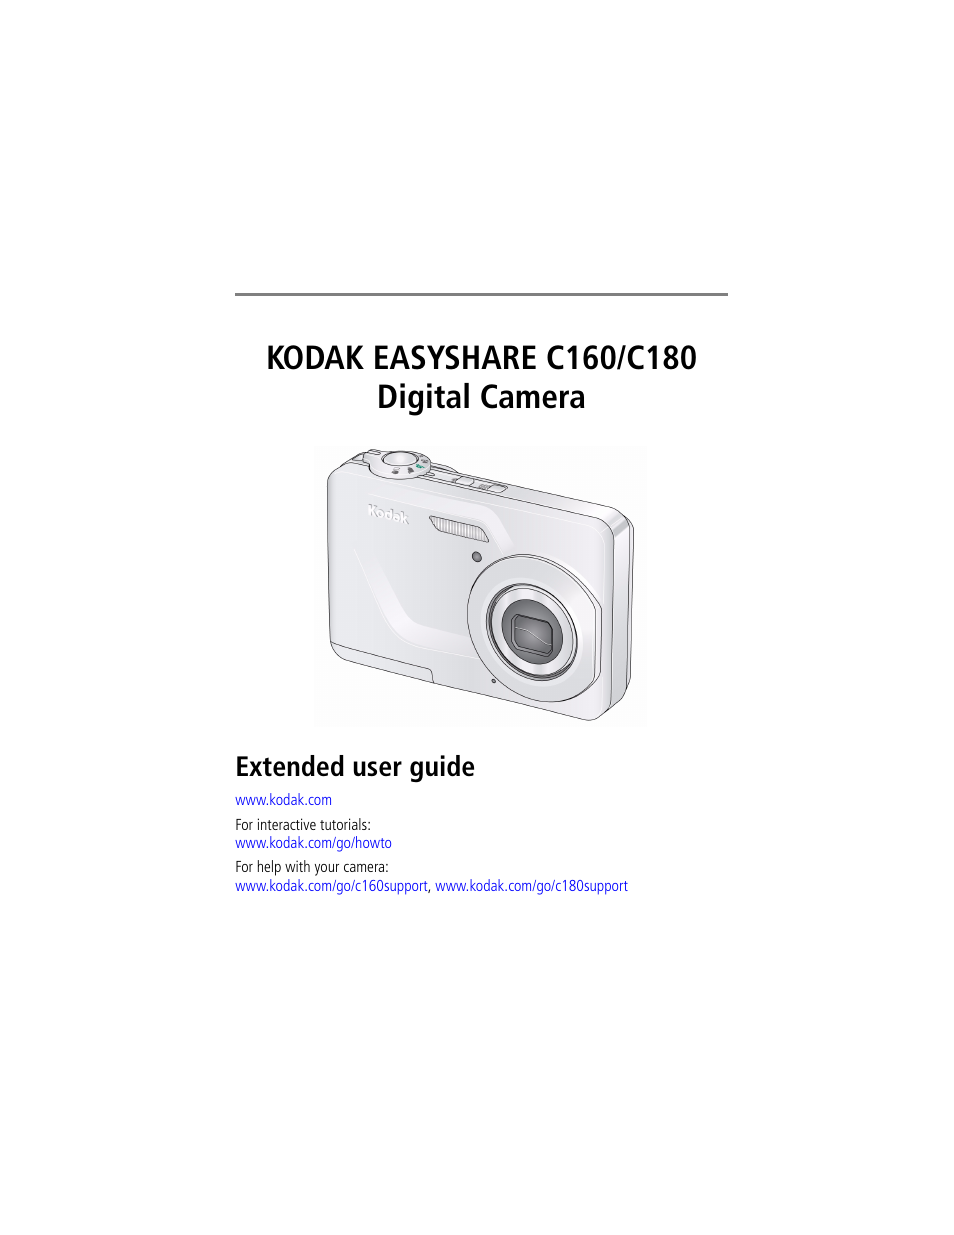 kodak easyshare c180 user manual 64 pages also for easyshare rh manualsdir com user guide sharepoint online library user guide sharepoint